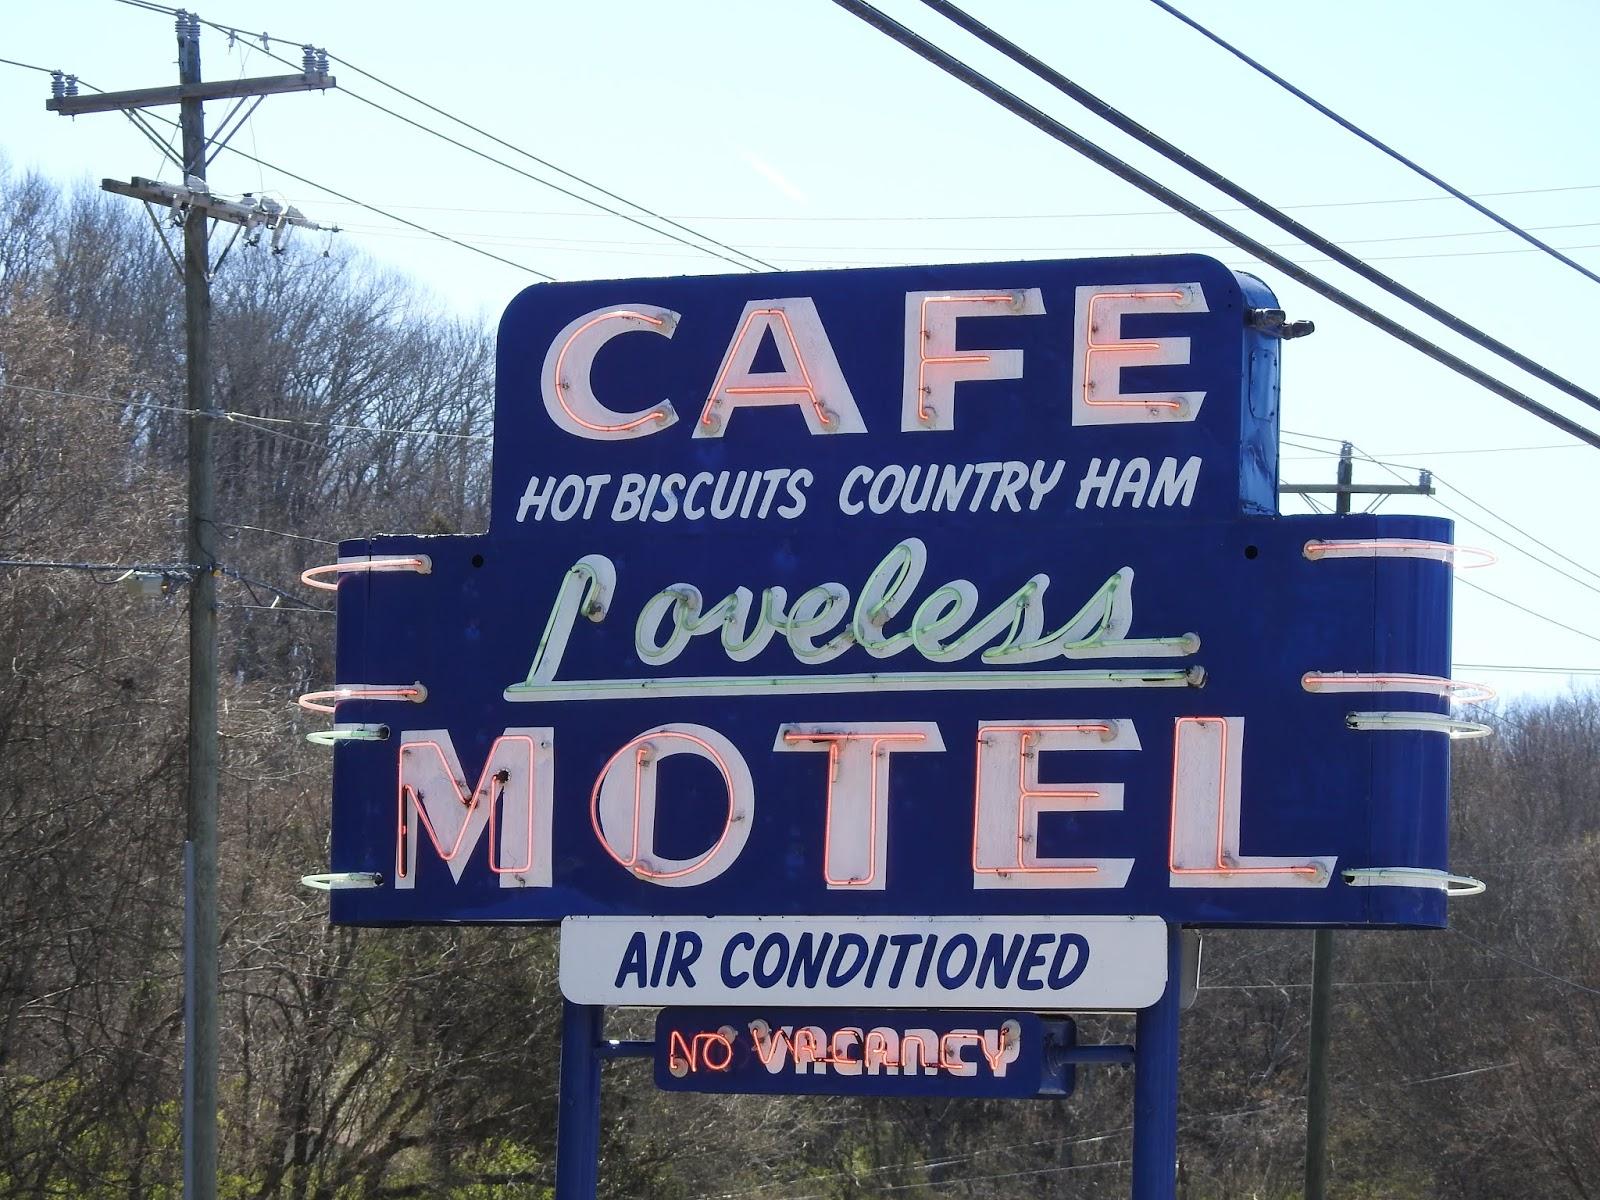 Loveless Cafe